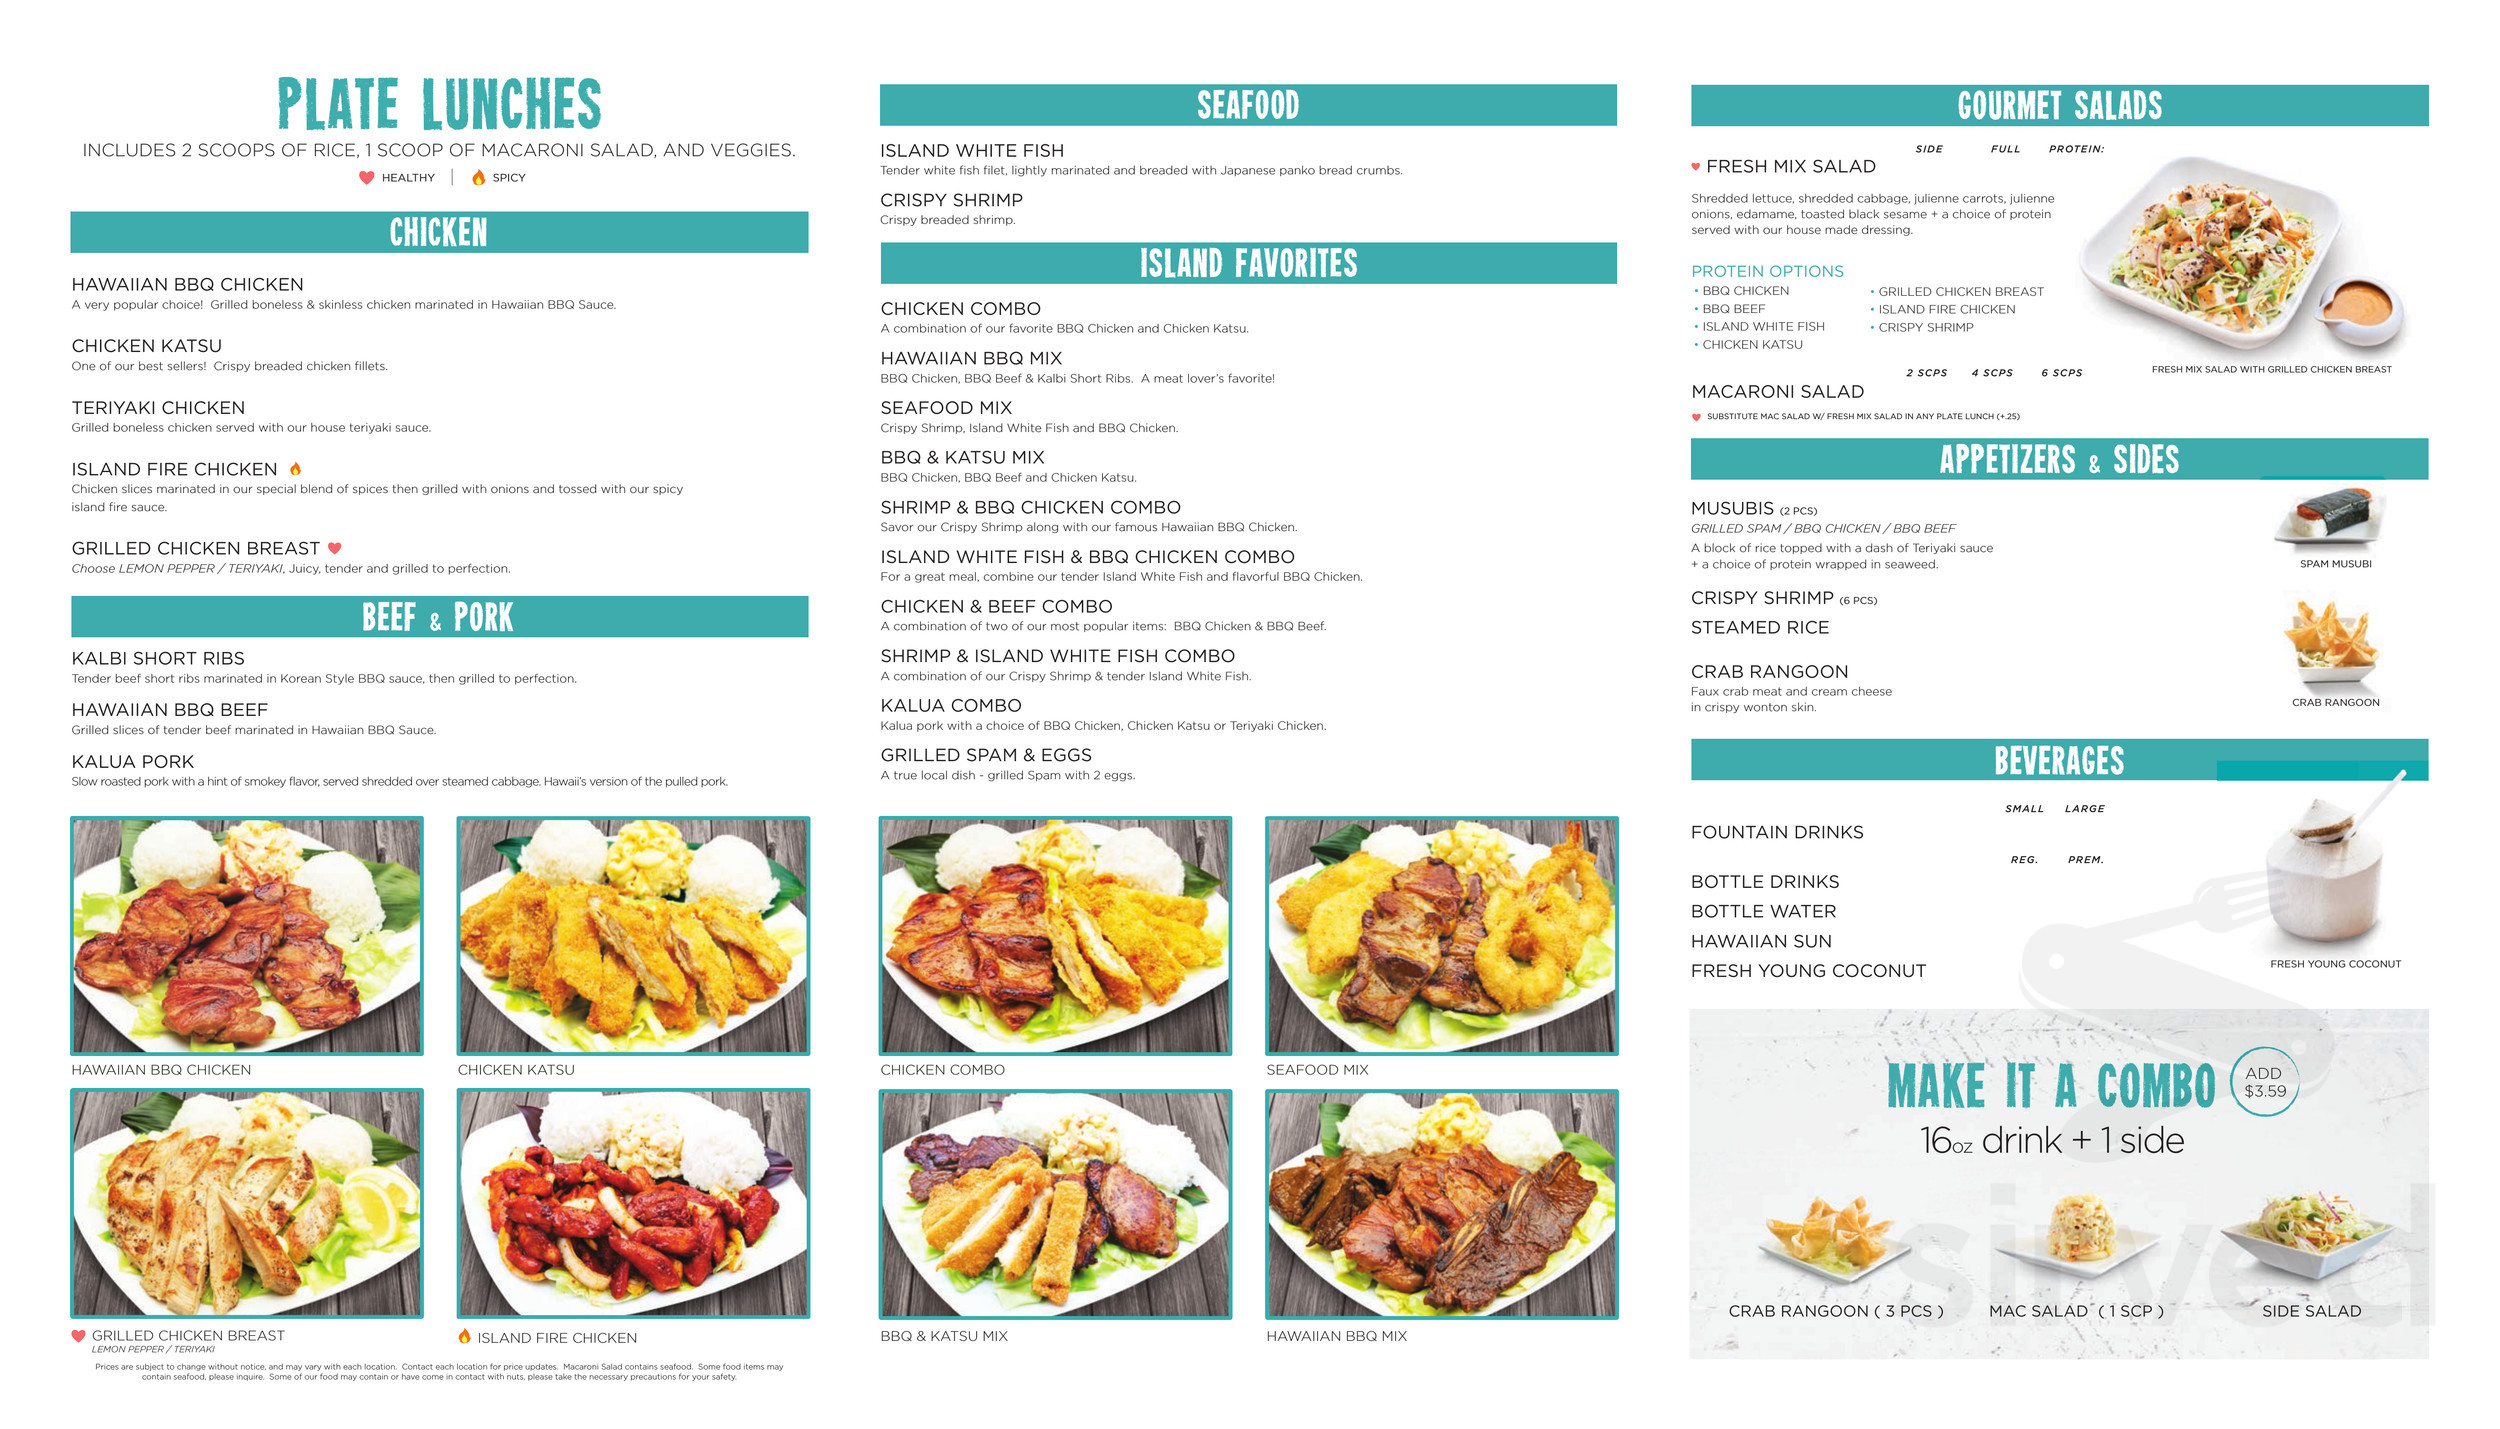 Ono Hawaiian BBQ menu in Rancho Cucamonga, California, USA